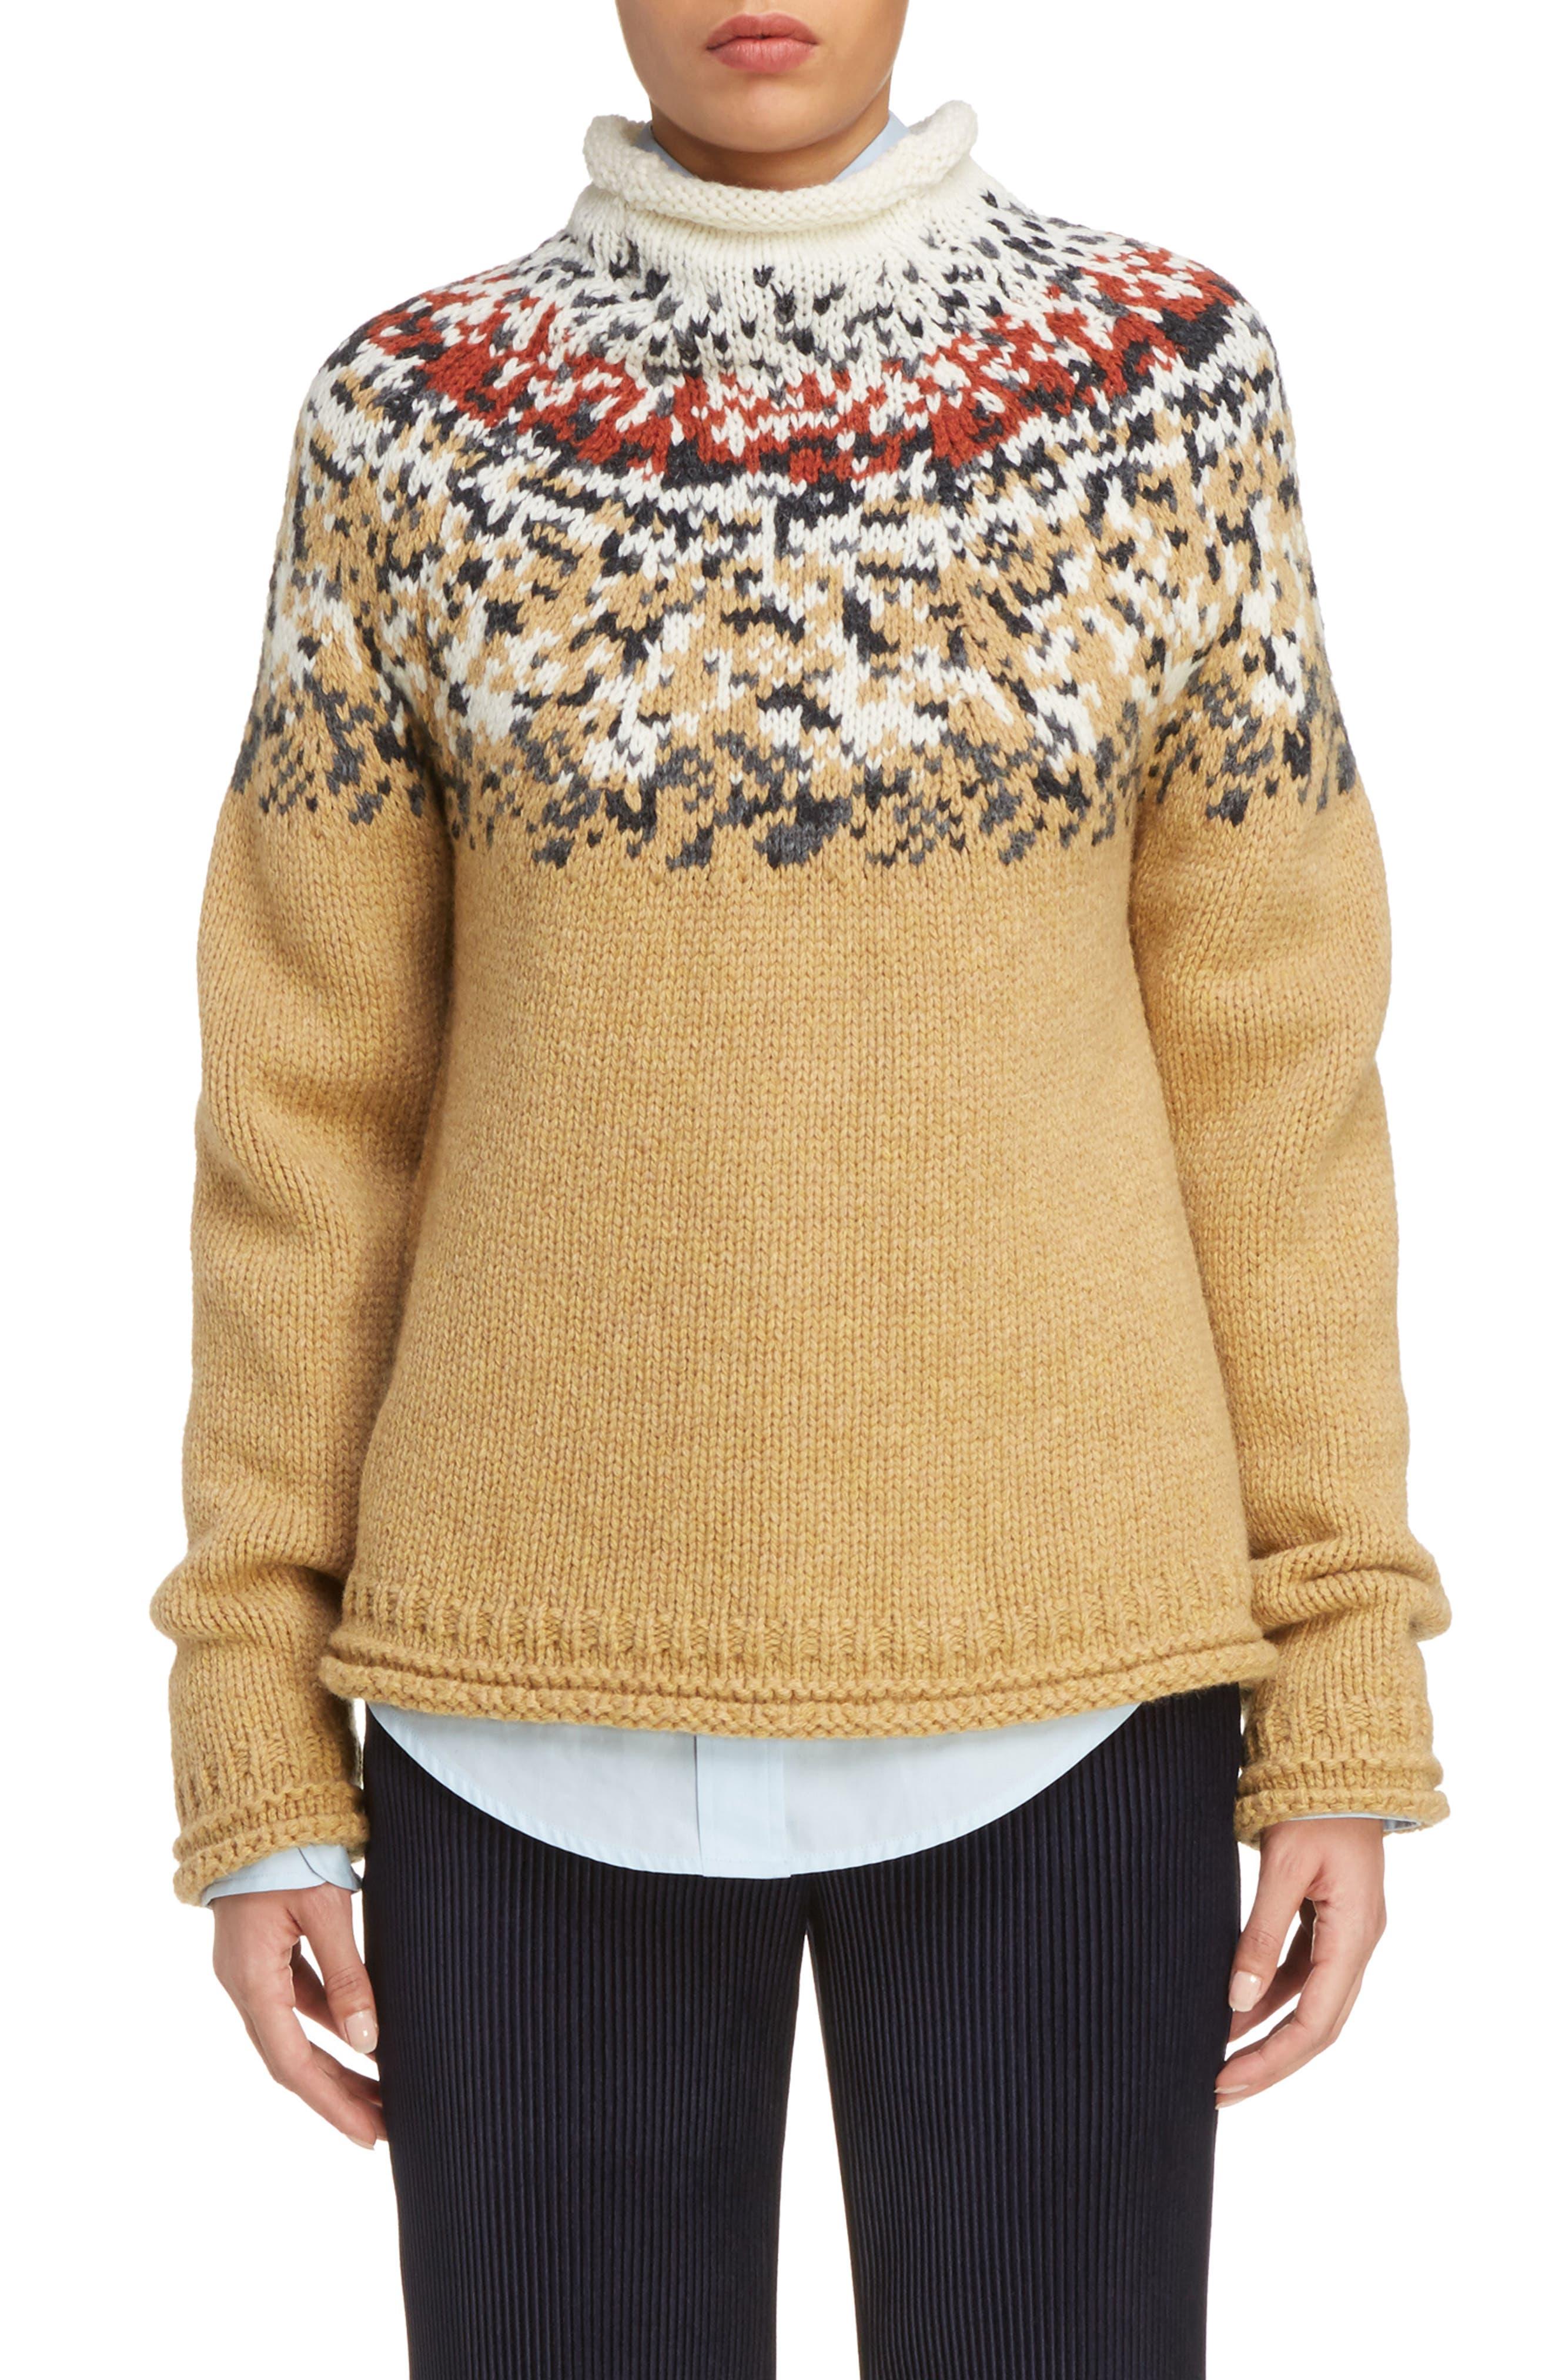 Sirius Heavy Icelandic High Neck Sweater,                             Main thumbnail 1, color,                             250